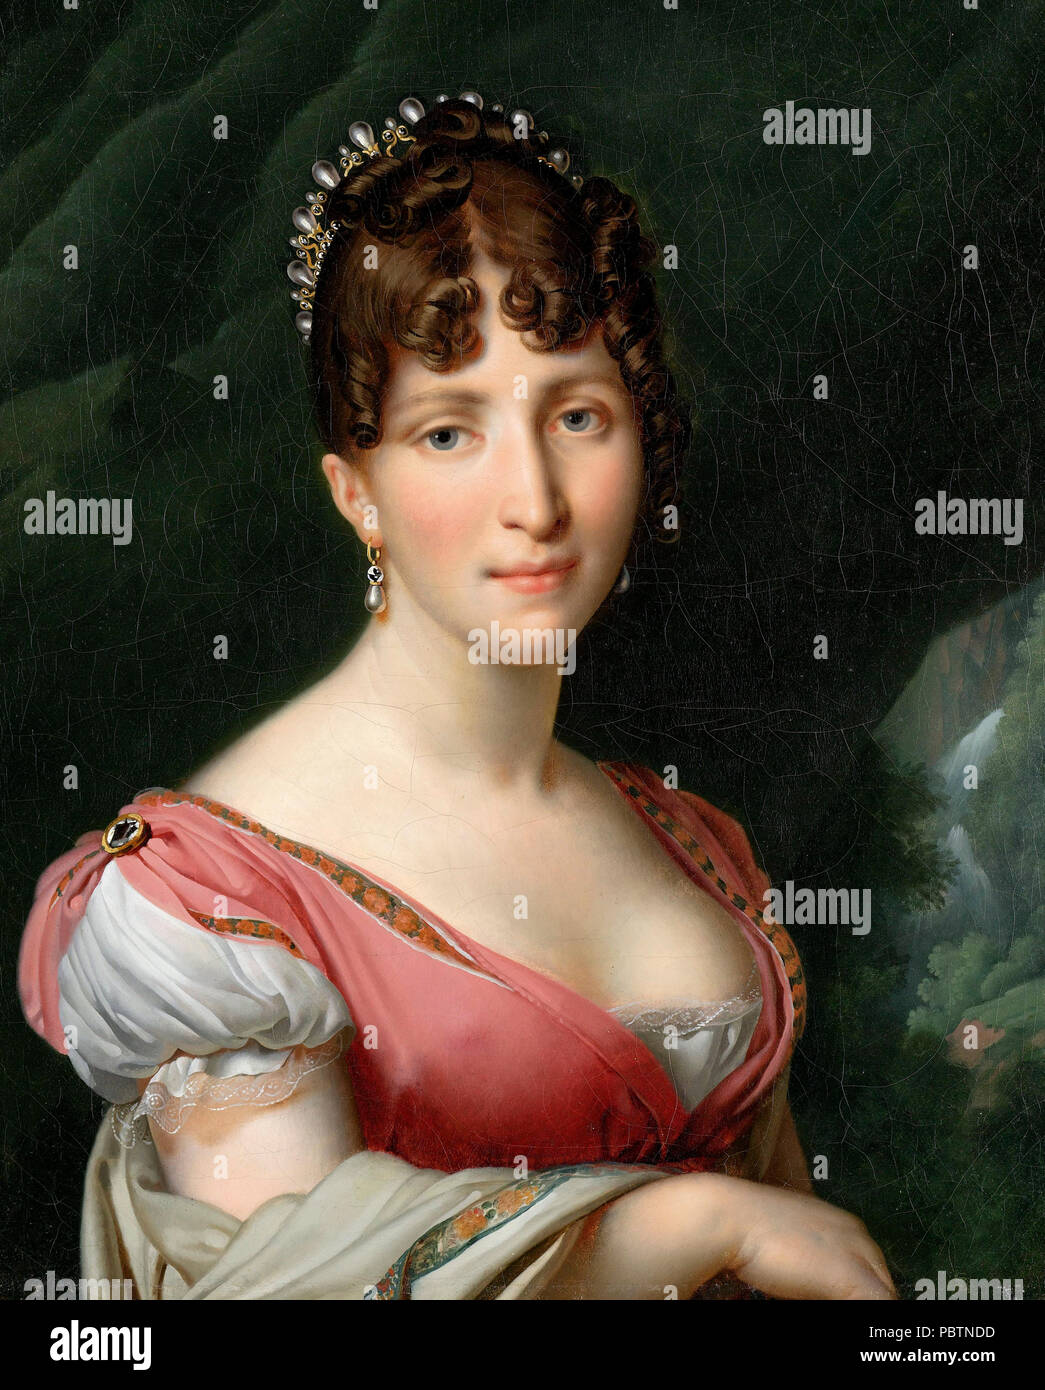 Ritratto di Hortense de Beauharnais, regina d'Olanda, moglie di Re Luigi Napoleone. Anne-Louis Girodet de Roussy-Trioson, circa 1805 Foto Stock